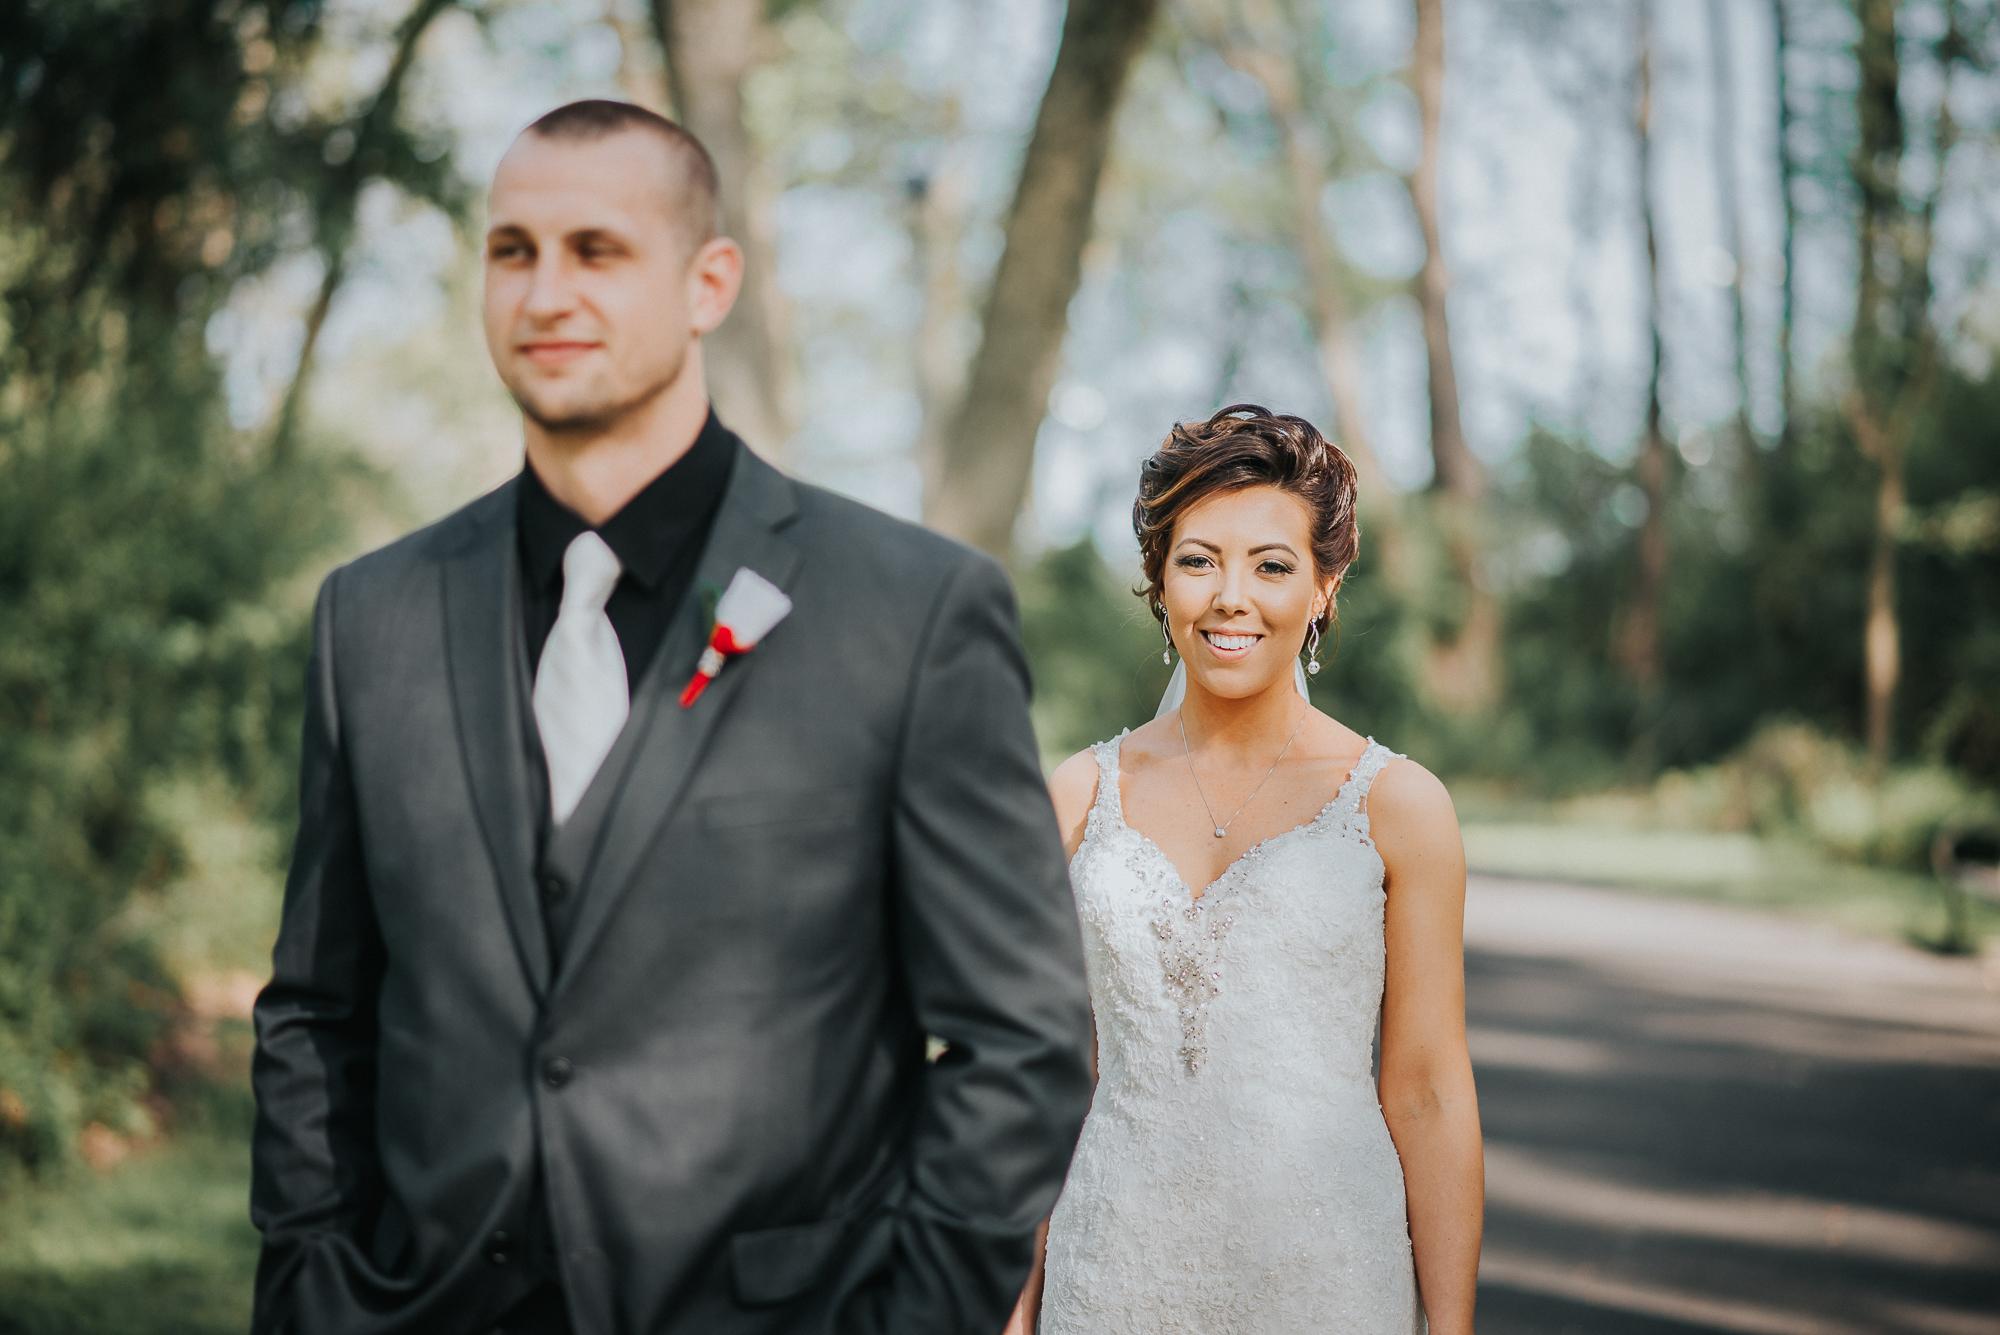 Christina-and-Gene-Wedding-Marla-Rain-Photography-146.jpg